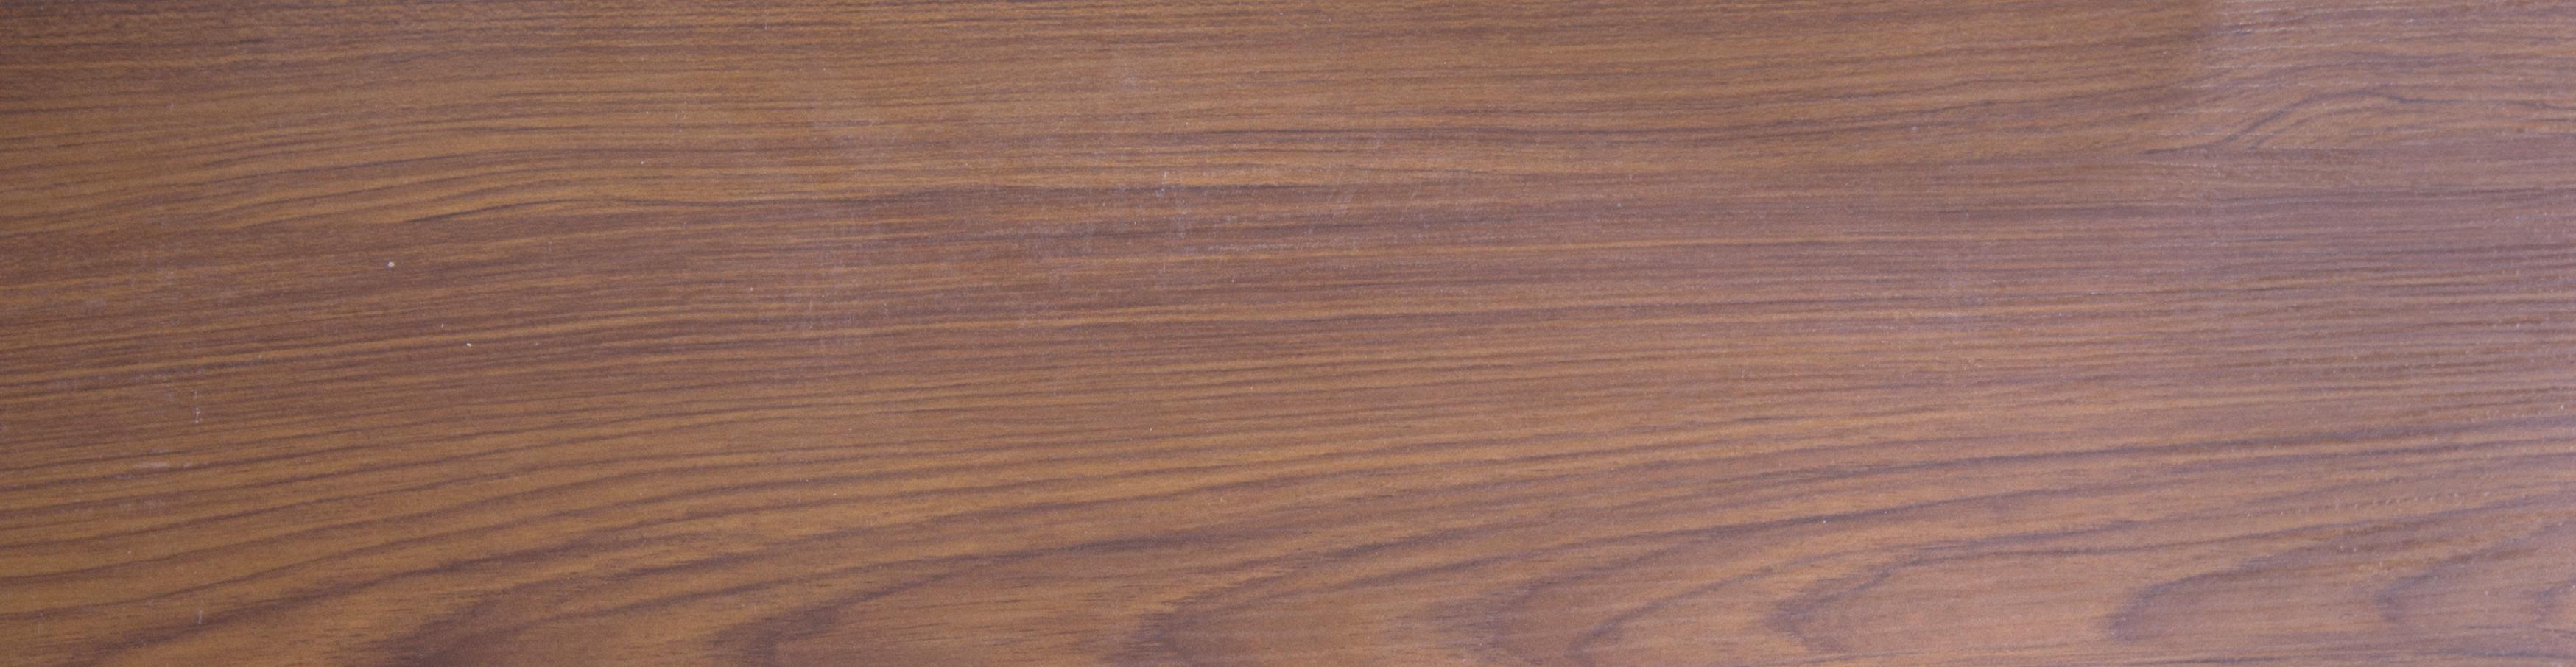 Teak Wooden Flooring Texture : Home > Wooden > Natural Teak : Wooden Flooring